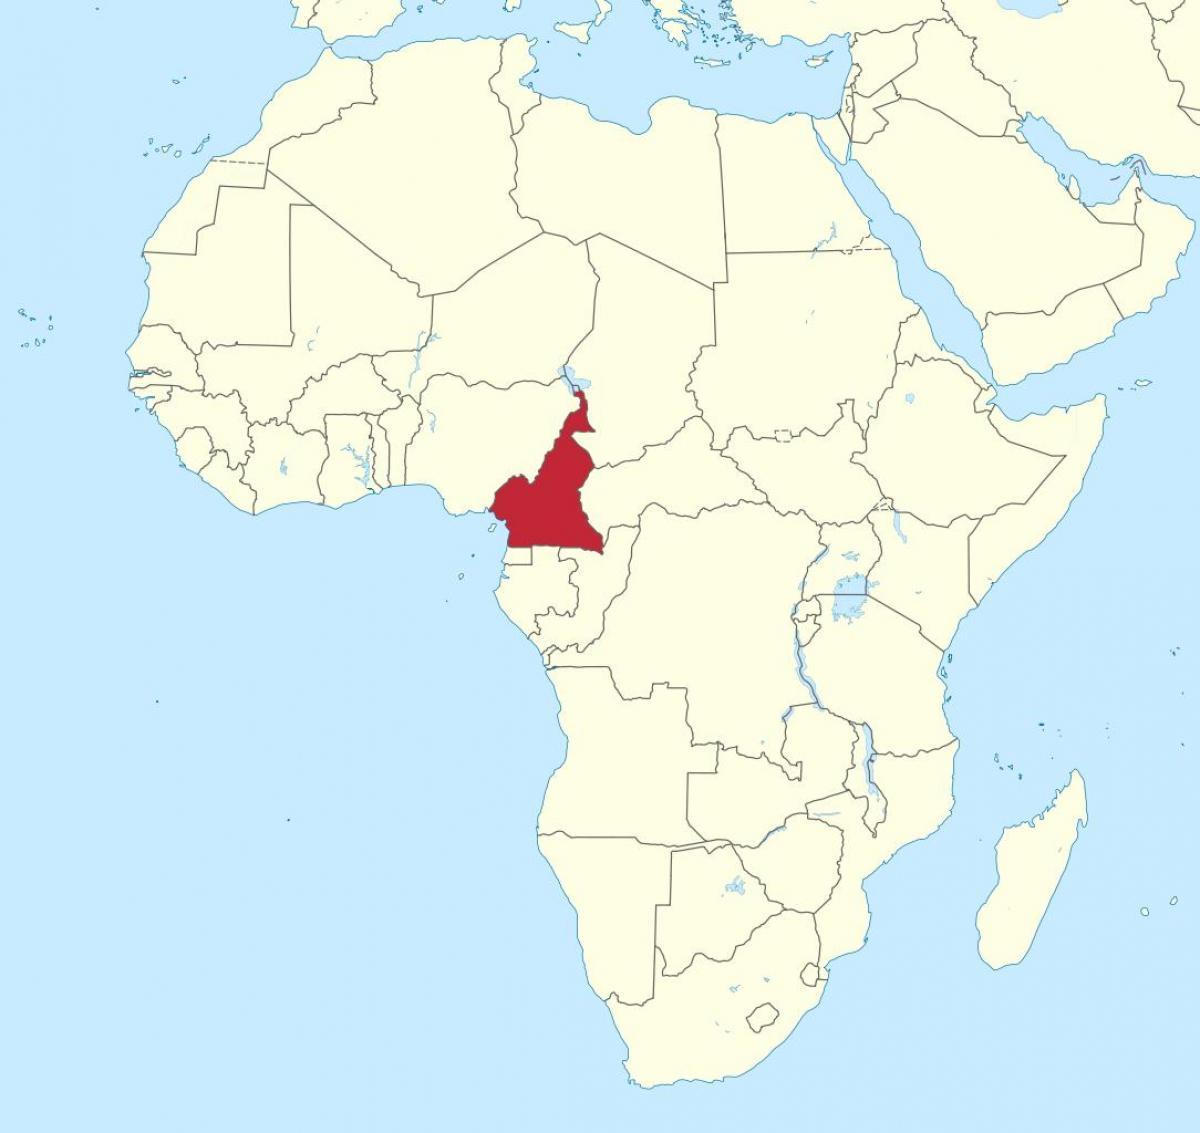 Cameroun I Vestafrika Kort Kort Over Cameroun I Vestafrika